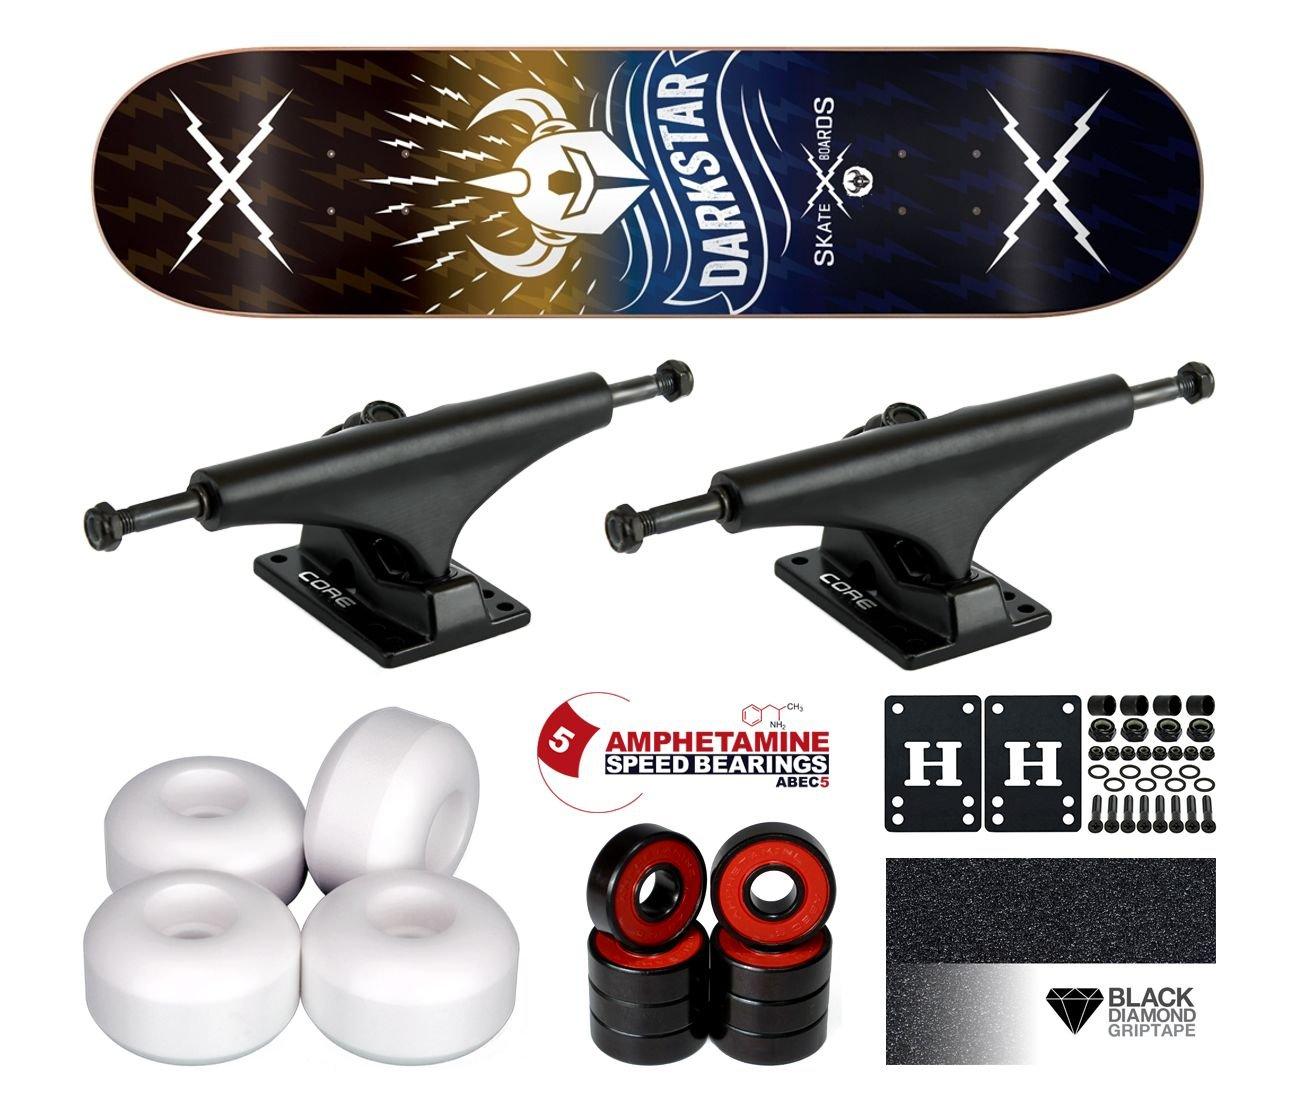 barato y de moda Dark Dark Dark Star Team Axis Yellow Blue PP Komplett Skateboard 8.125  respuestas rápidas